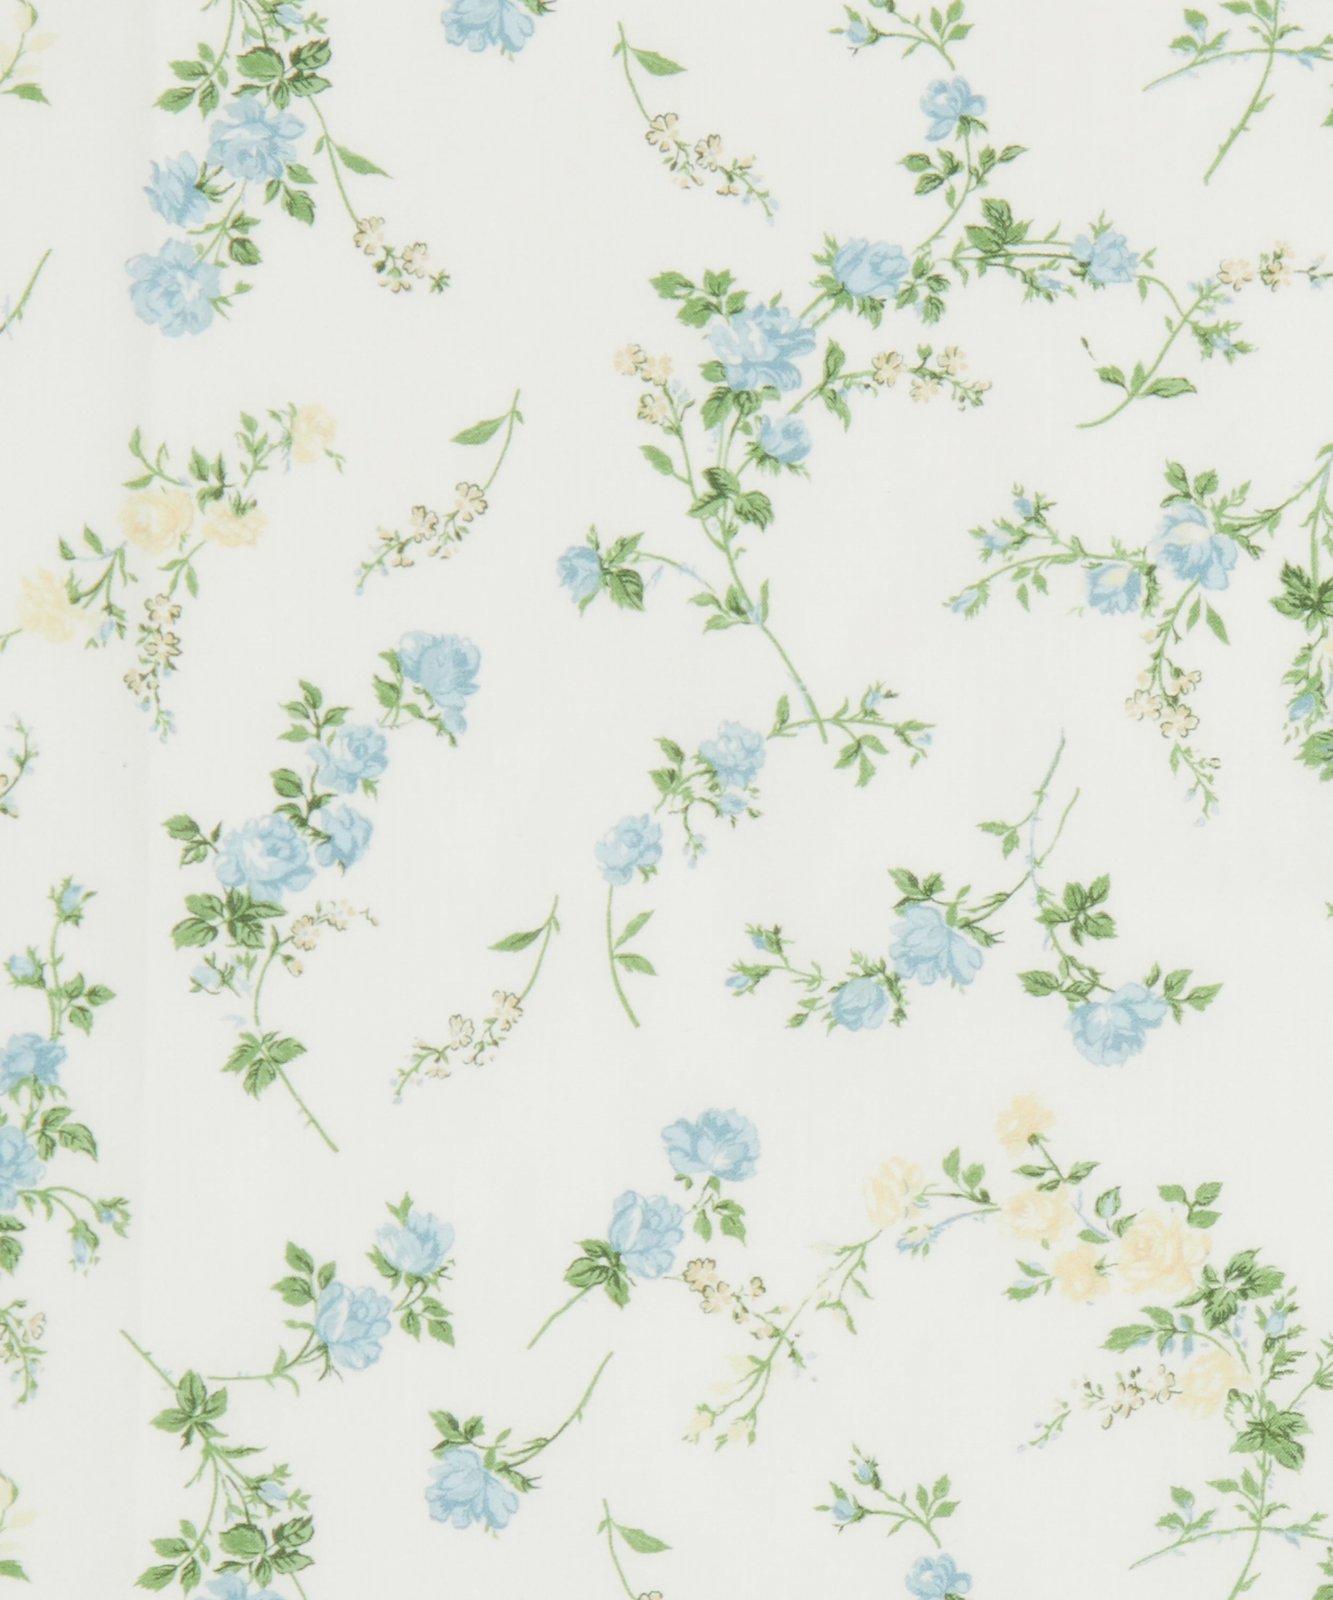 Elizabeth A Organic Liberty of London Tana Lawn Fabric